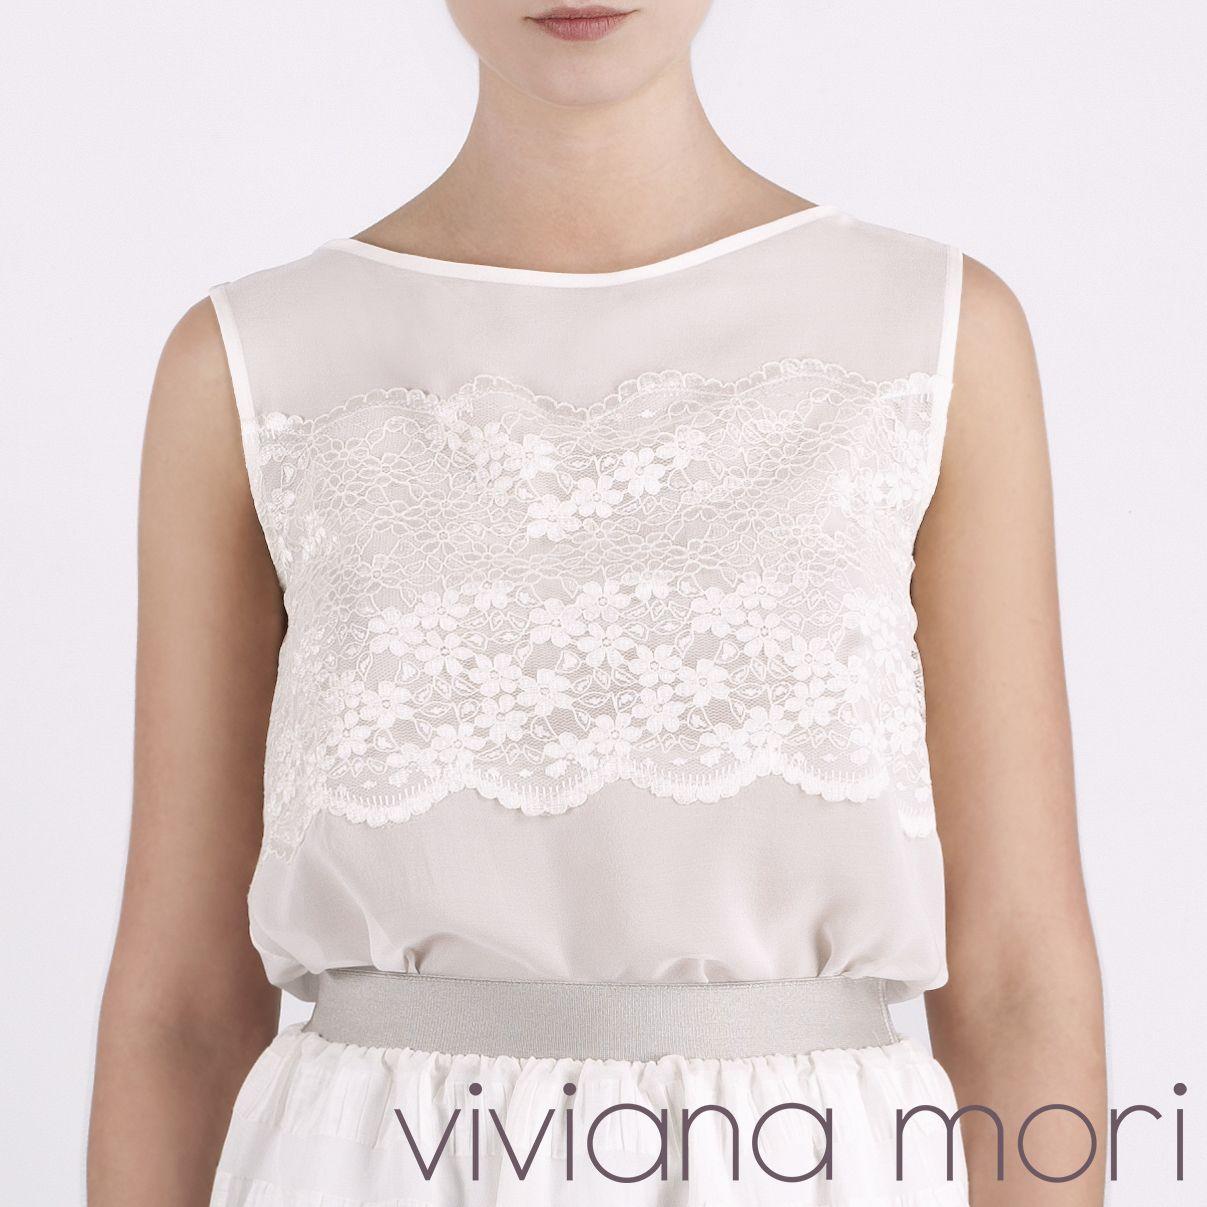 Viviana Mori Magnolia Top | vivianamori